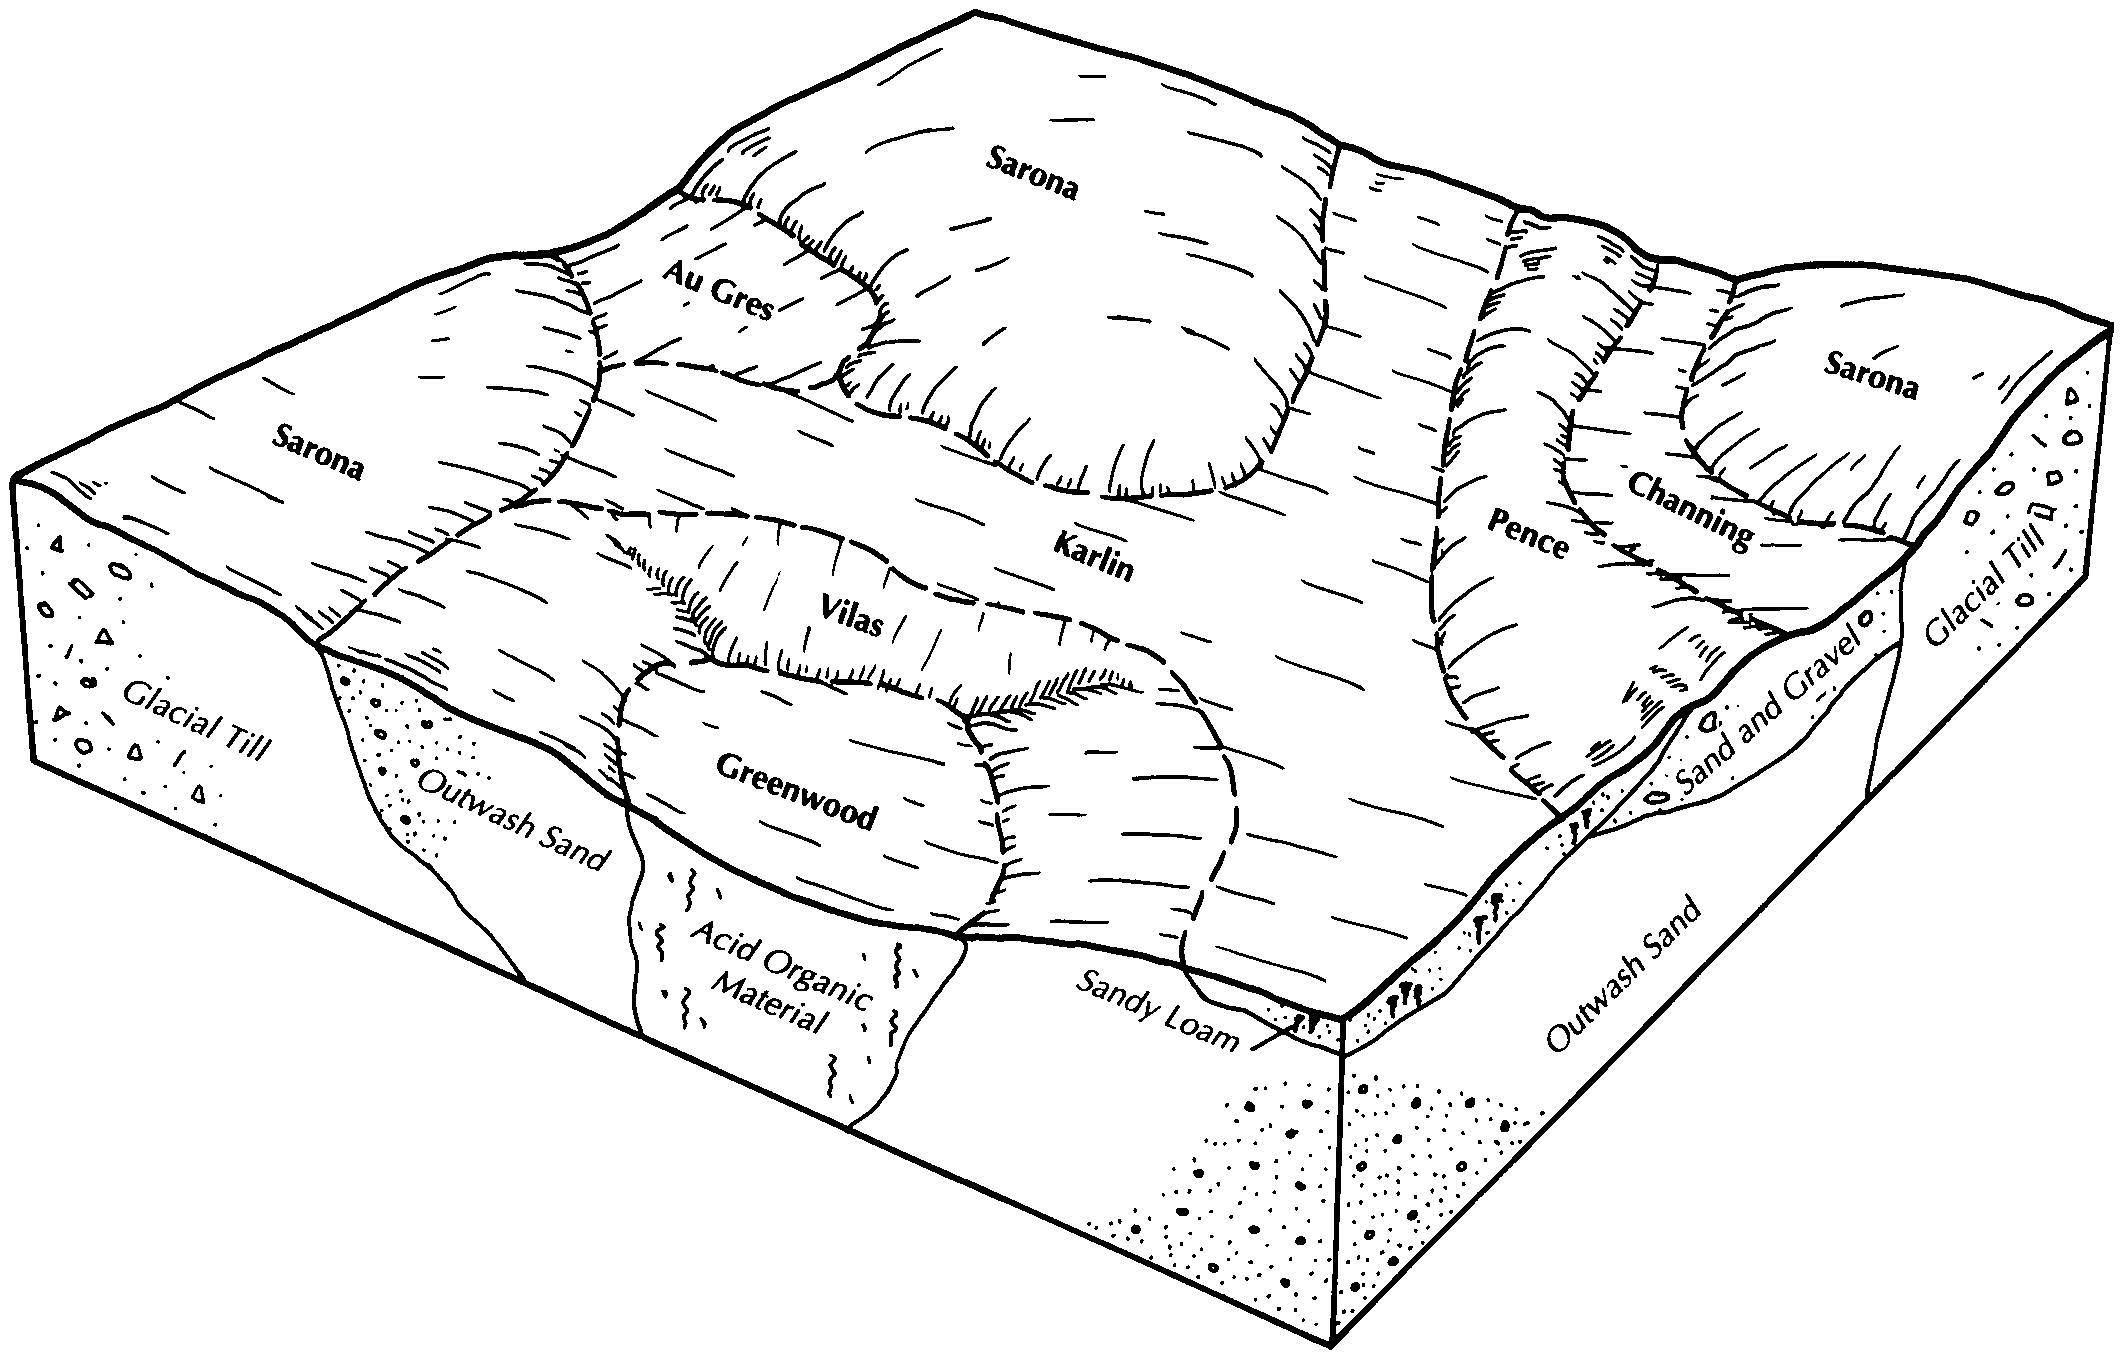 soil profile diagram of michigan 1995 chevy silverado 1500 wiring data explorer california resource lab mi 2012 02 06 27